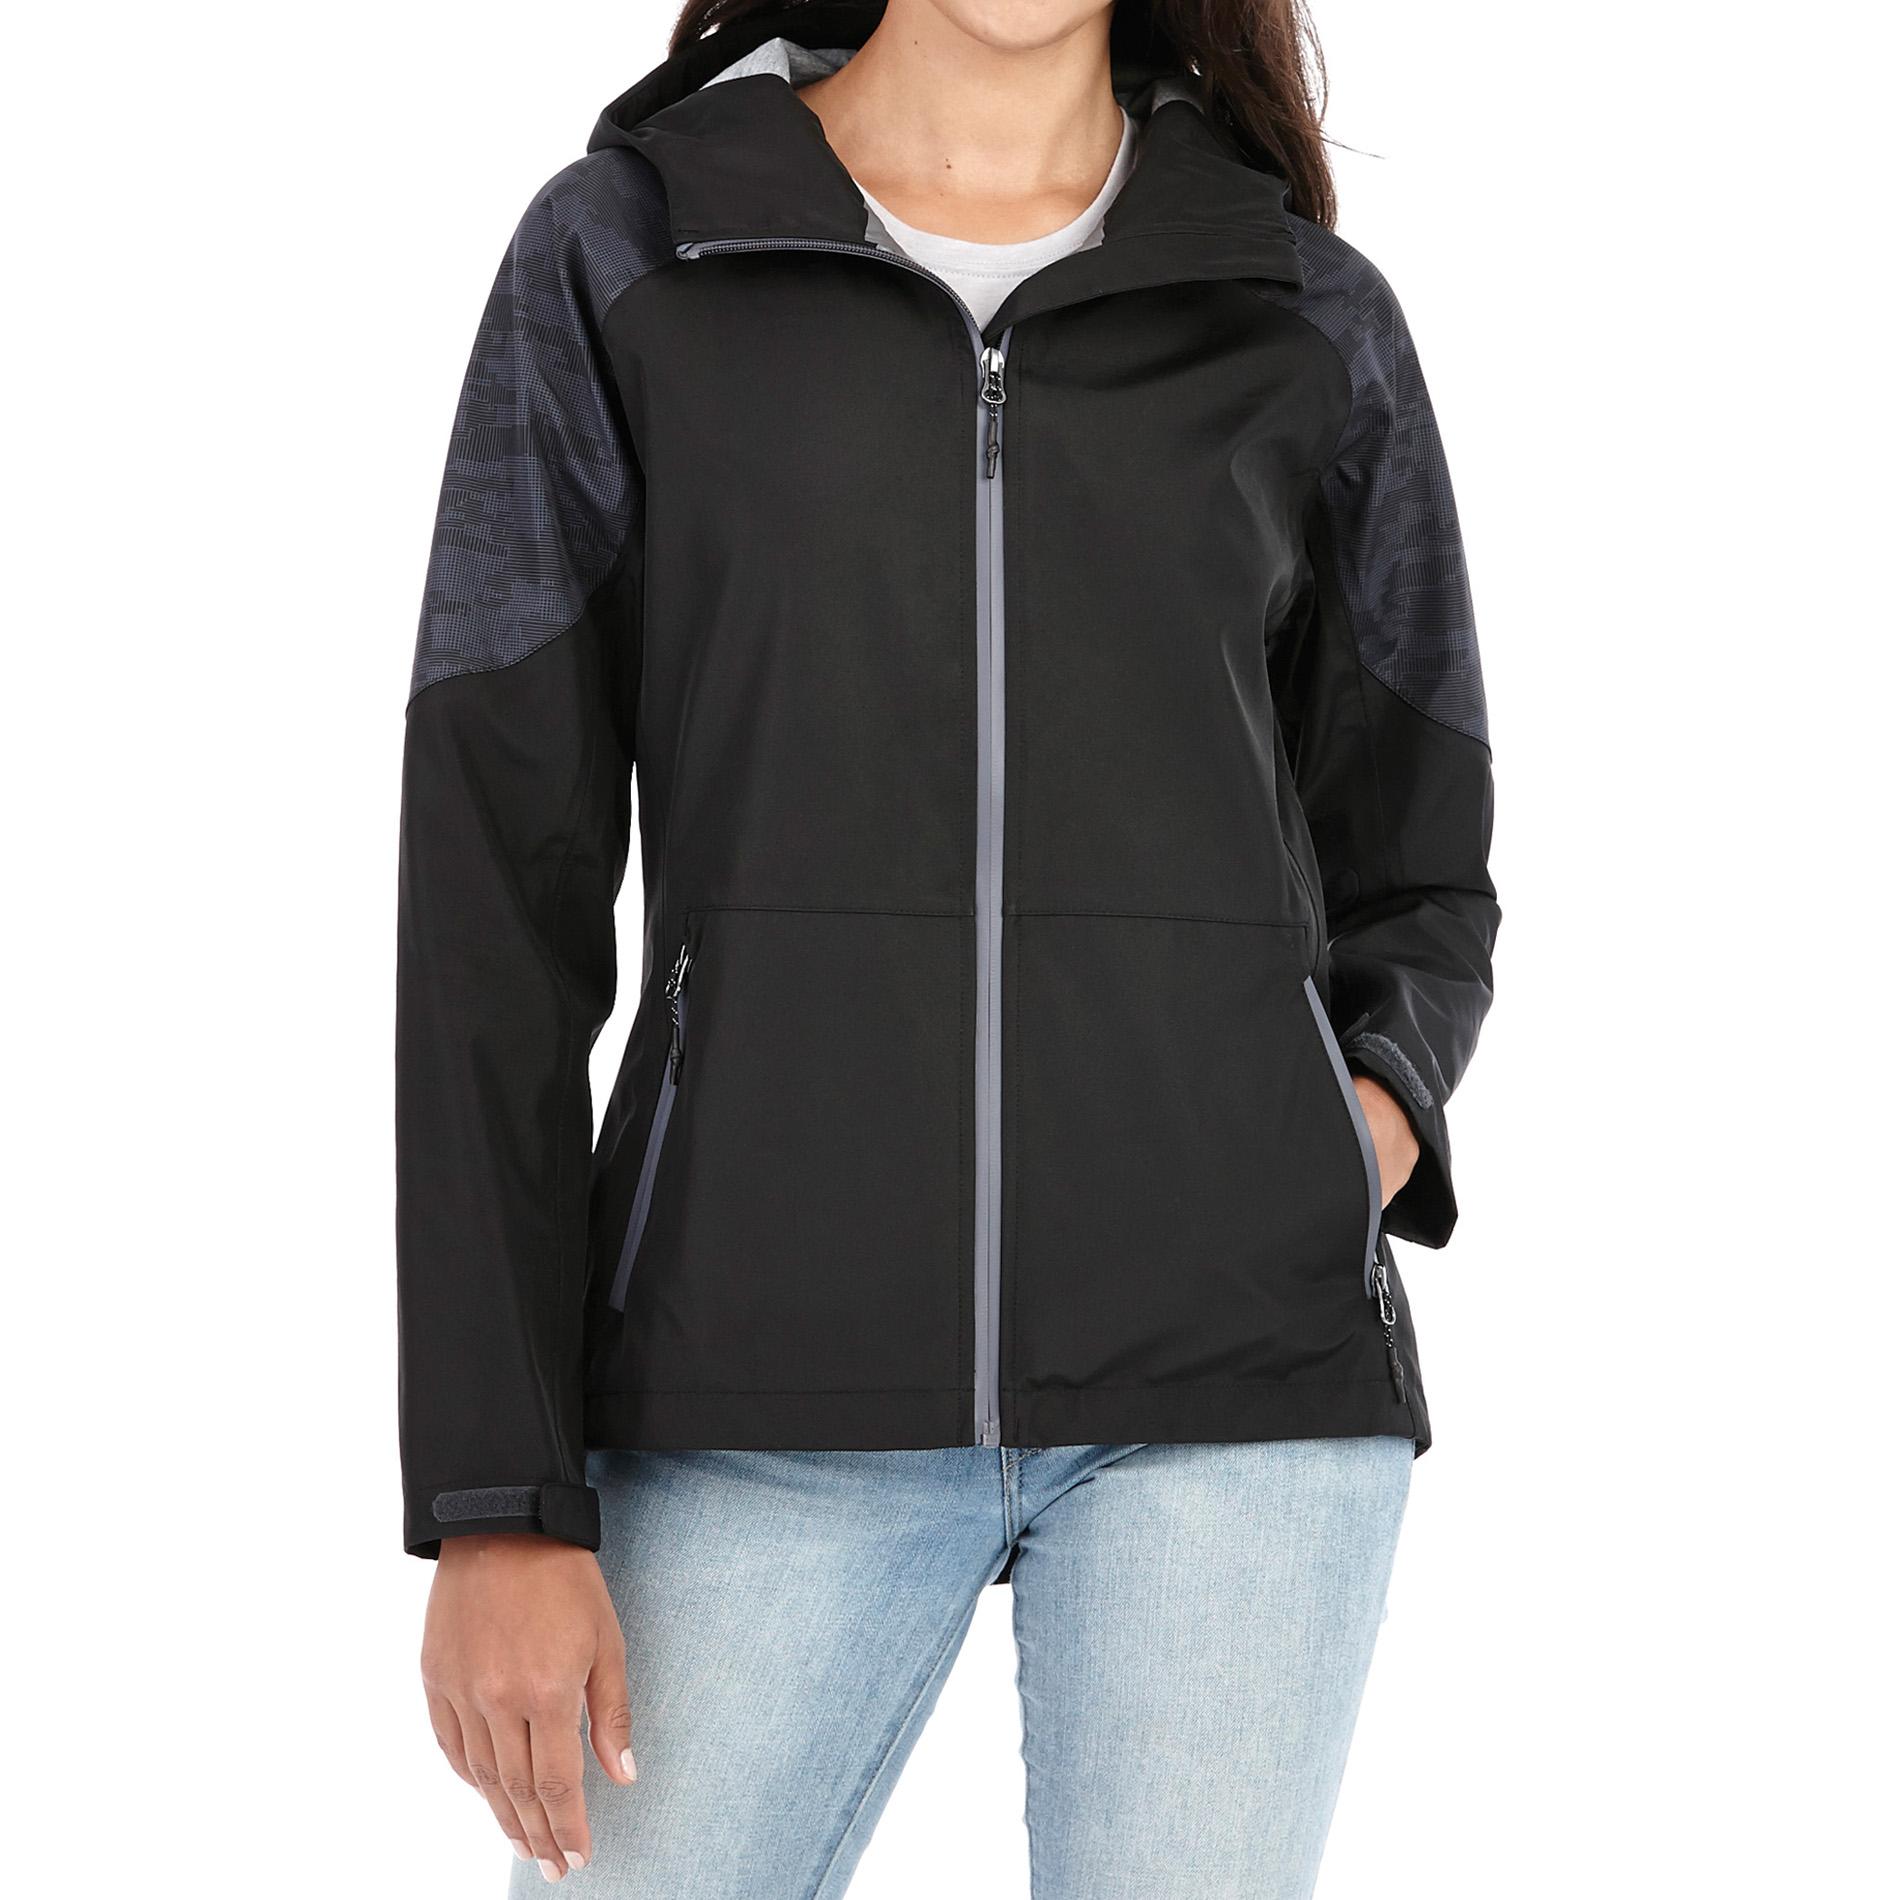 Elevate TM92936 - Women's INDEX Softshell Jacket